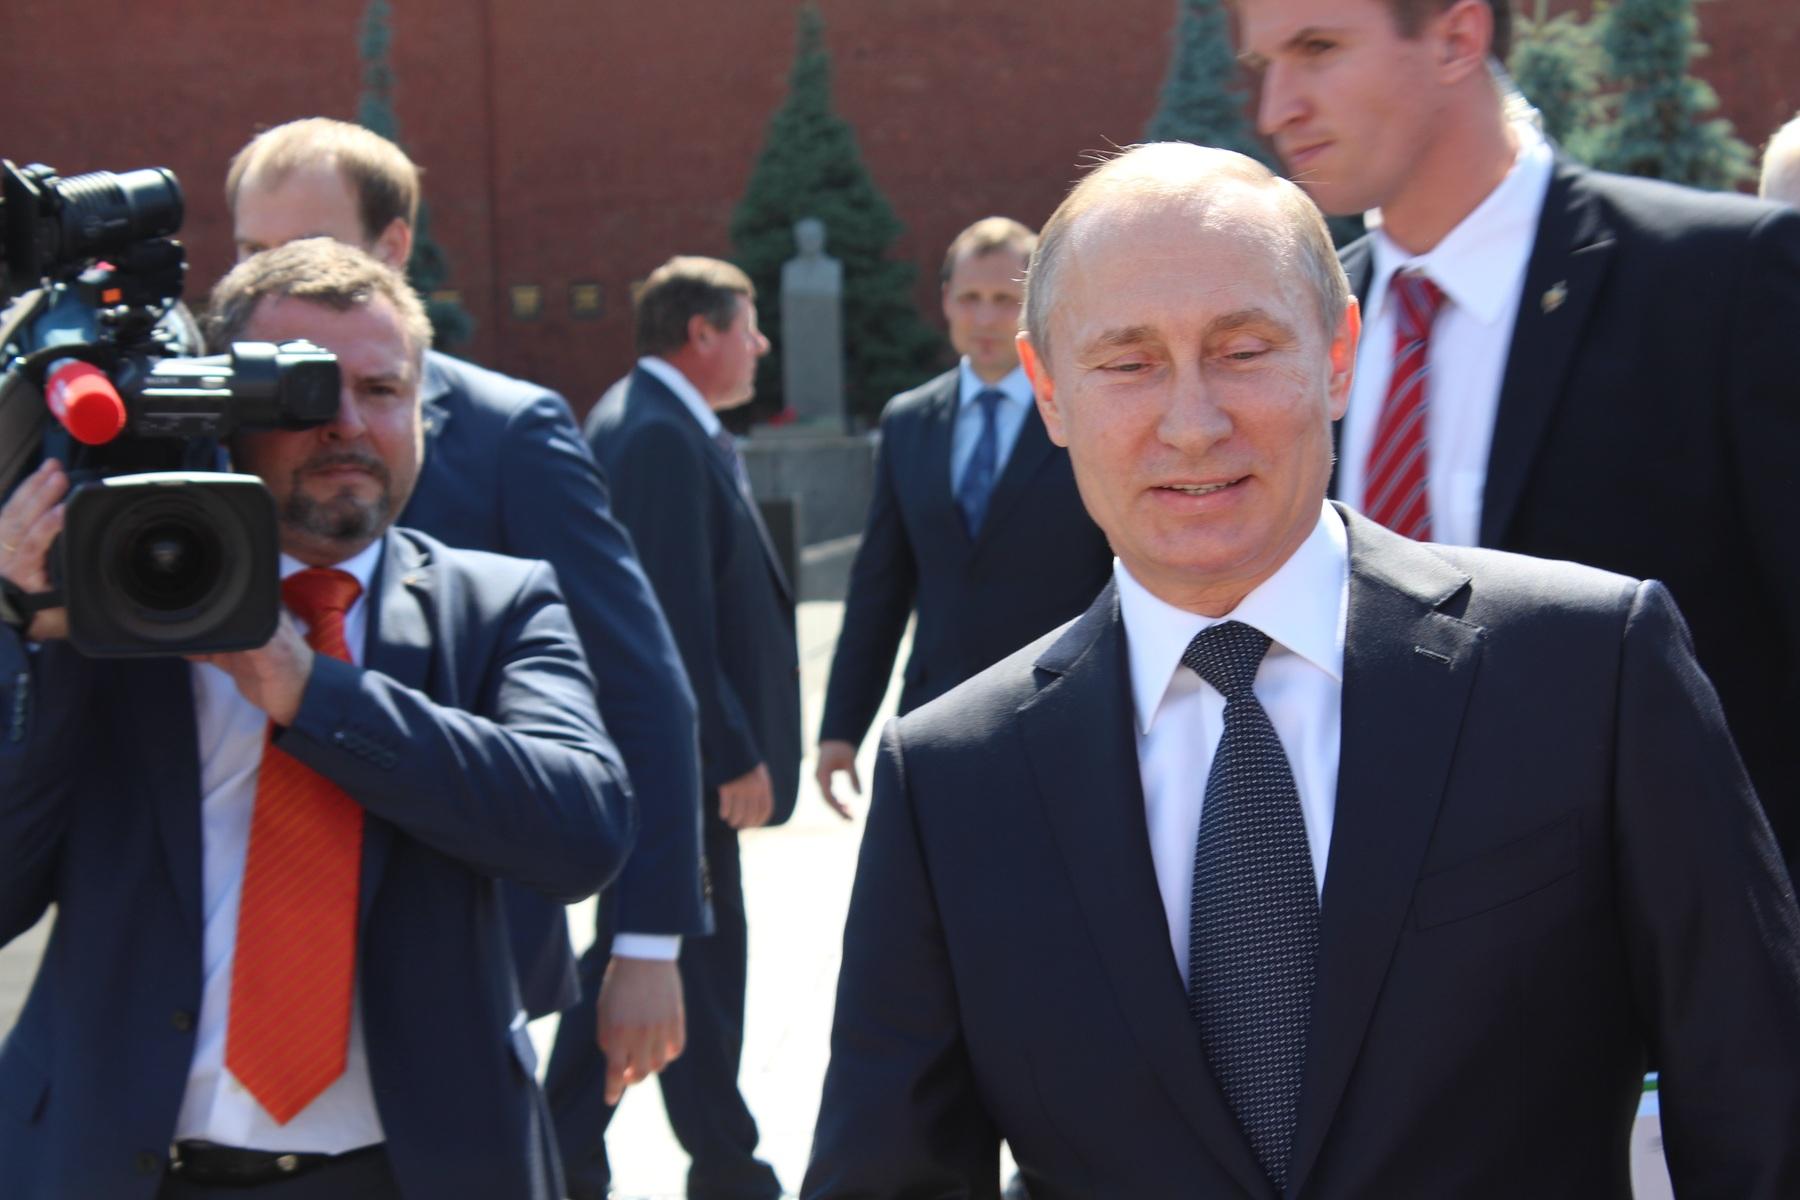 Putin, rusland, præsident